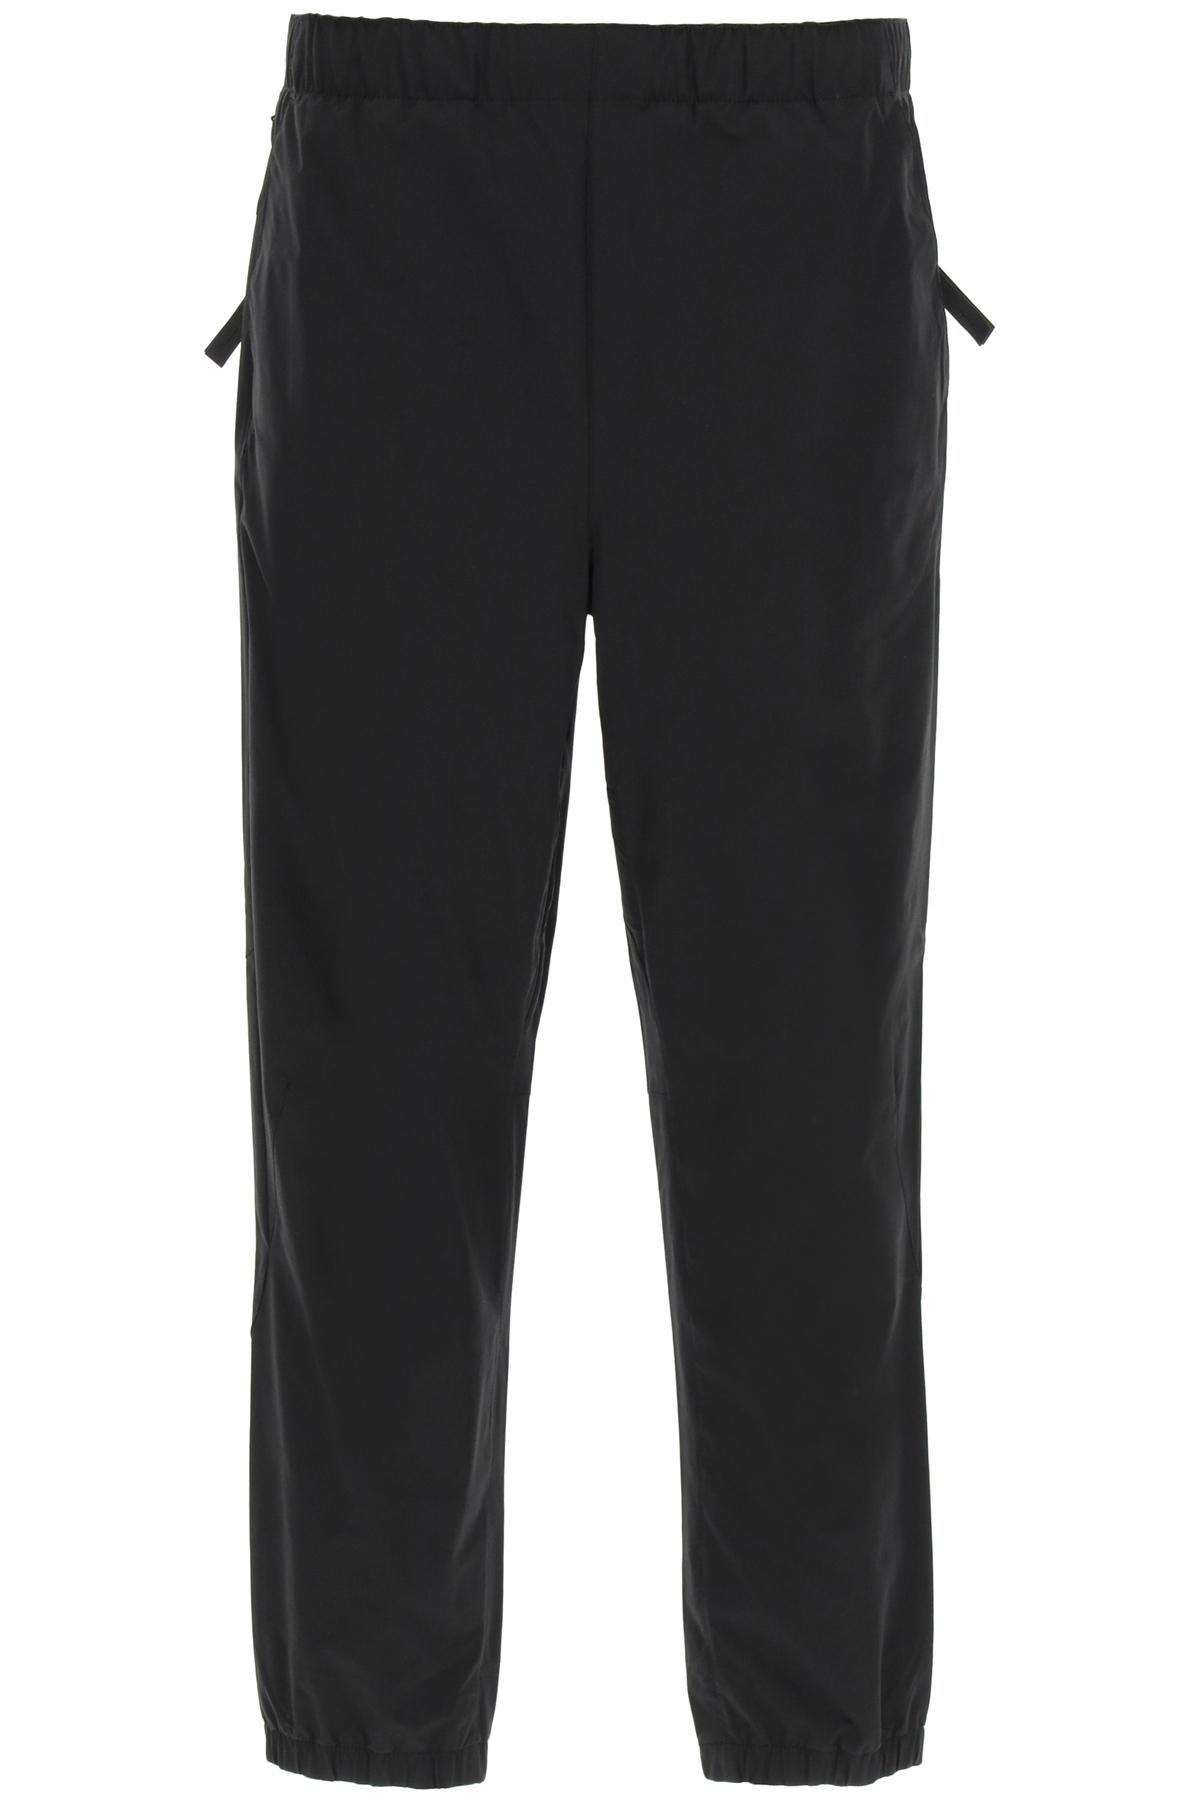 Carhartt pantaloni hurst